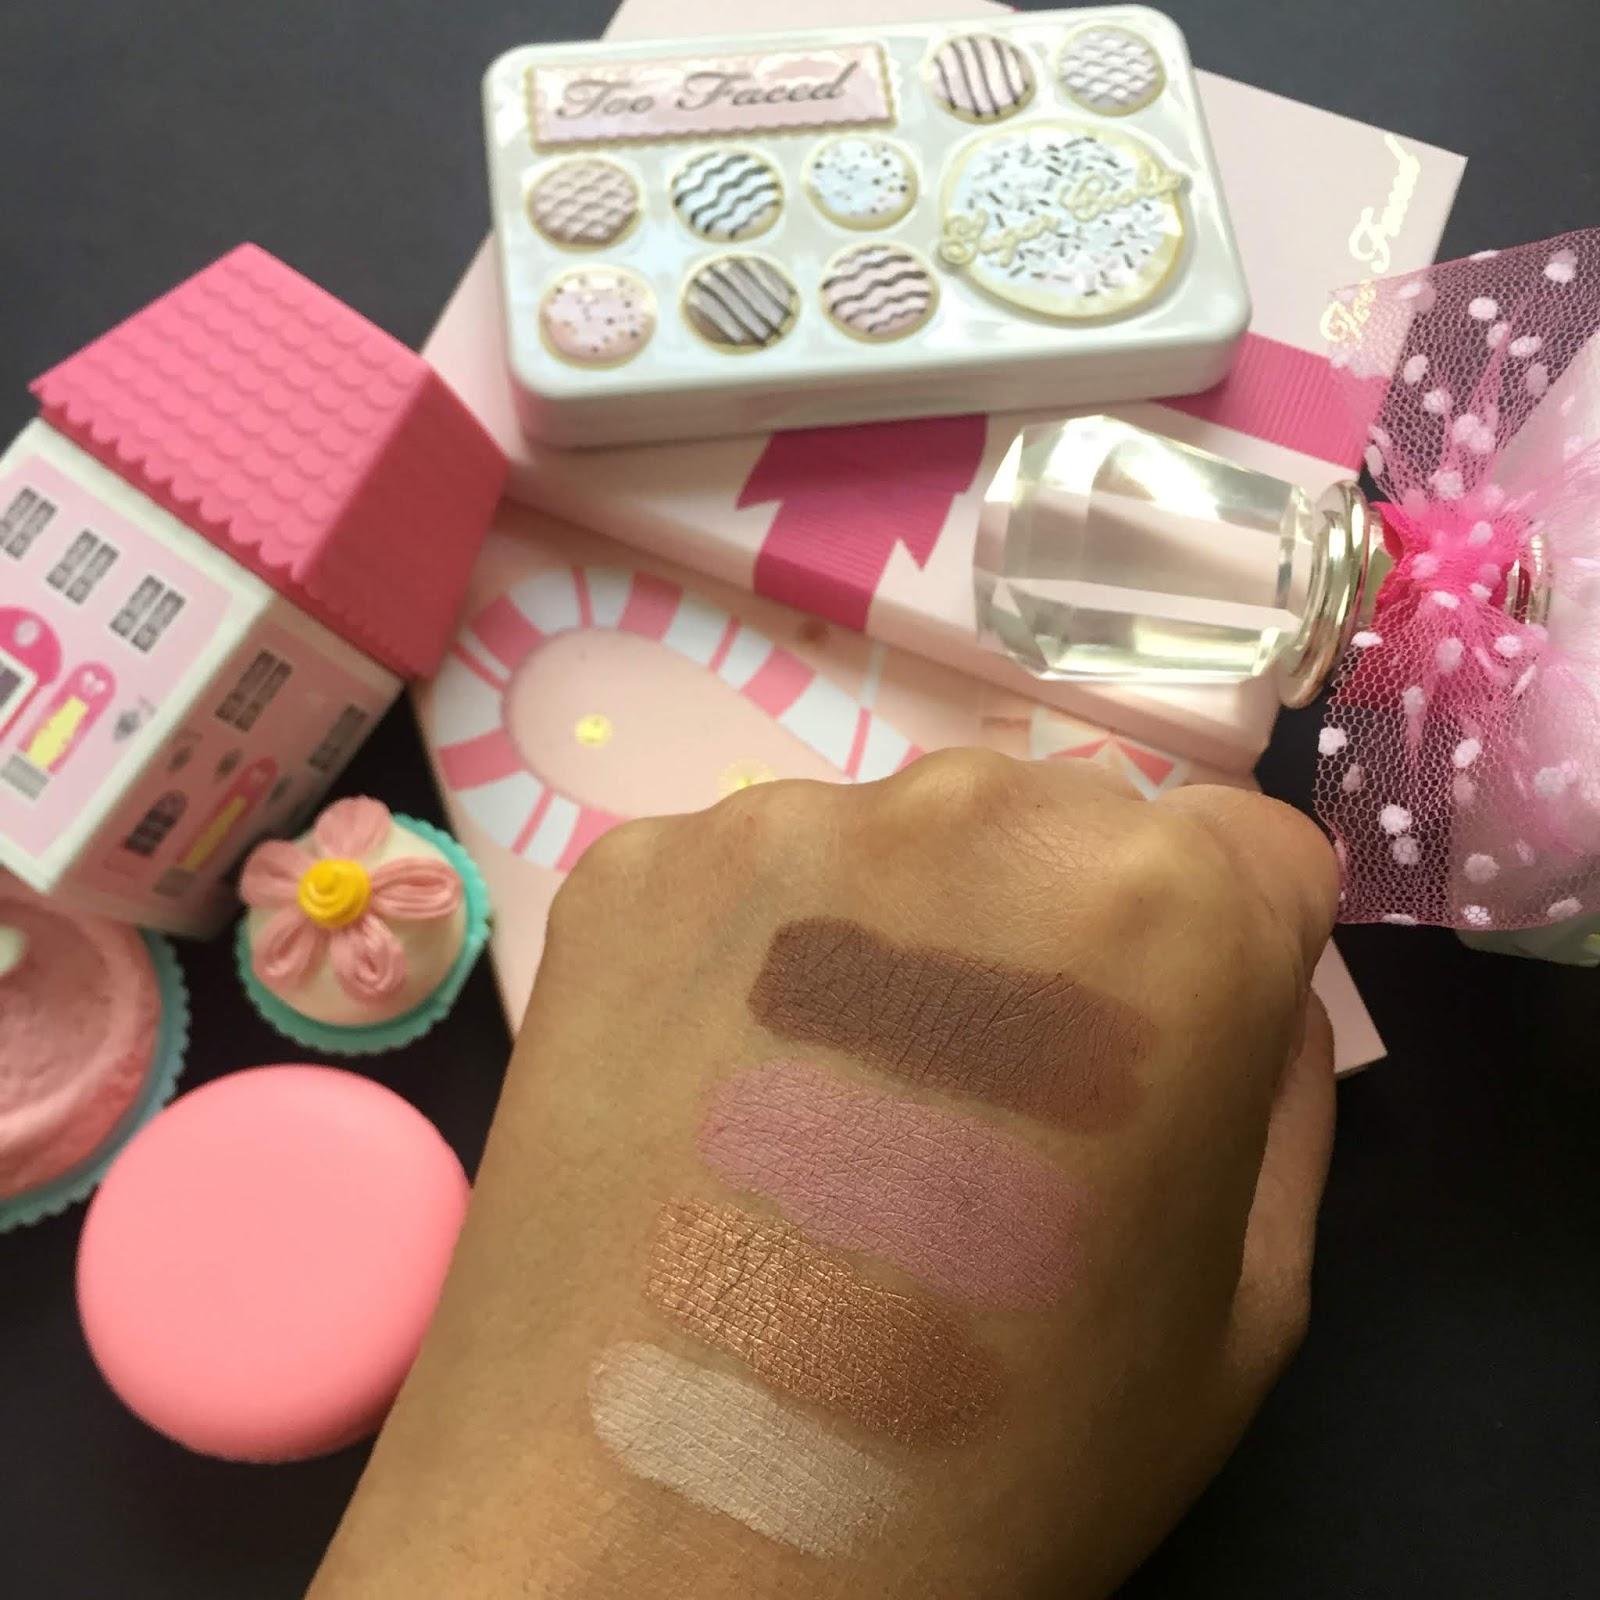 Sugar Cookie Eyeshadow Palette by Too Faced #5